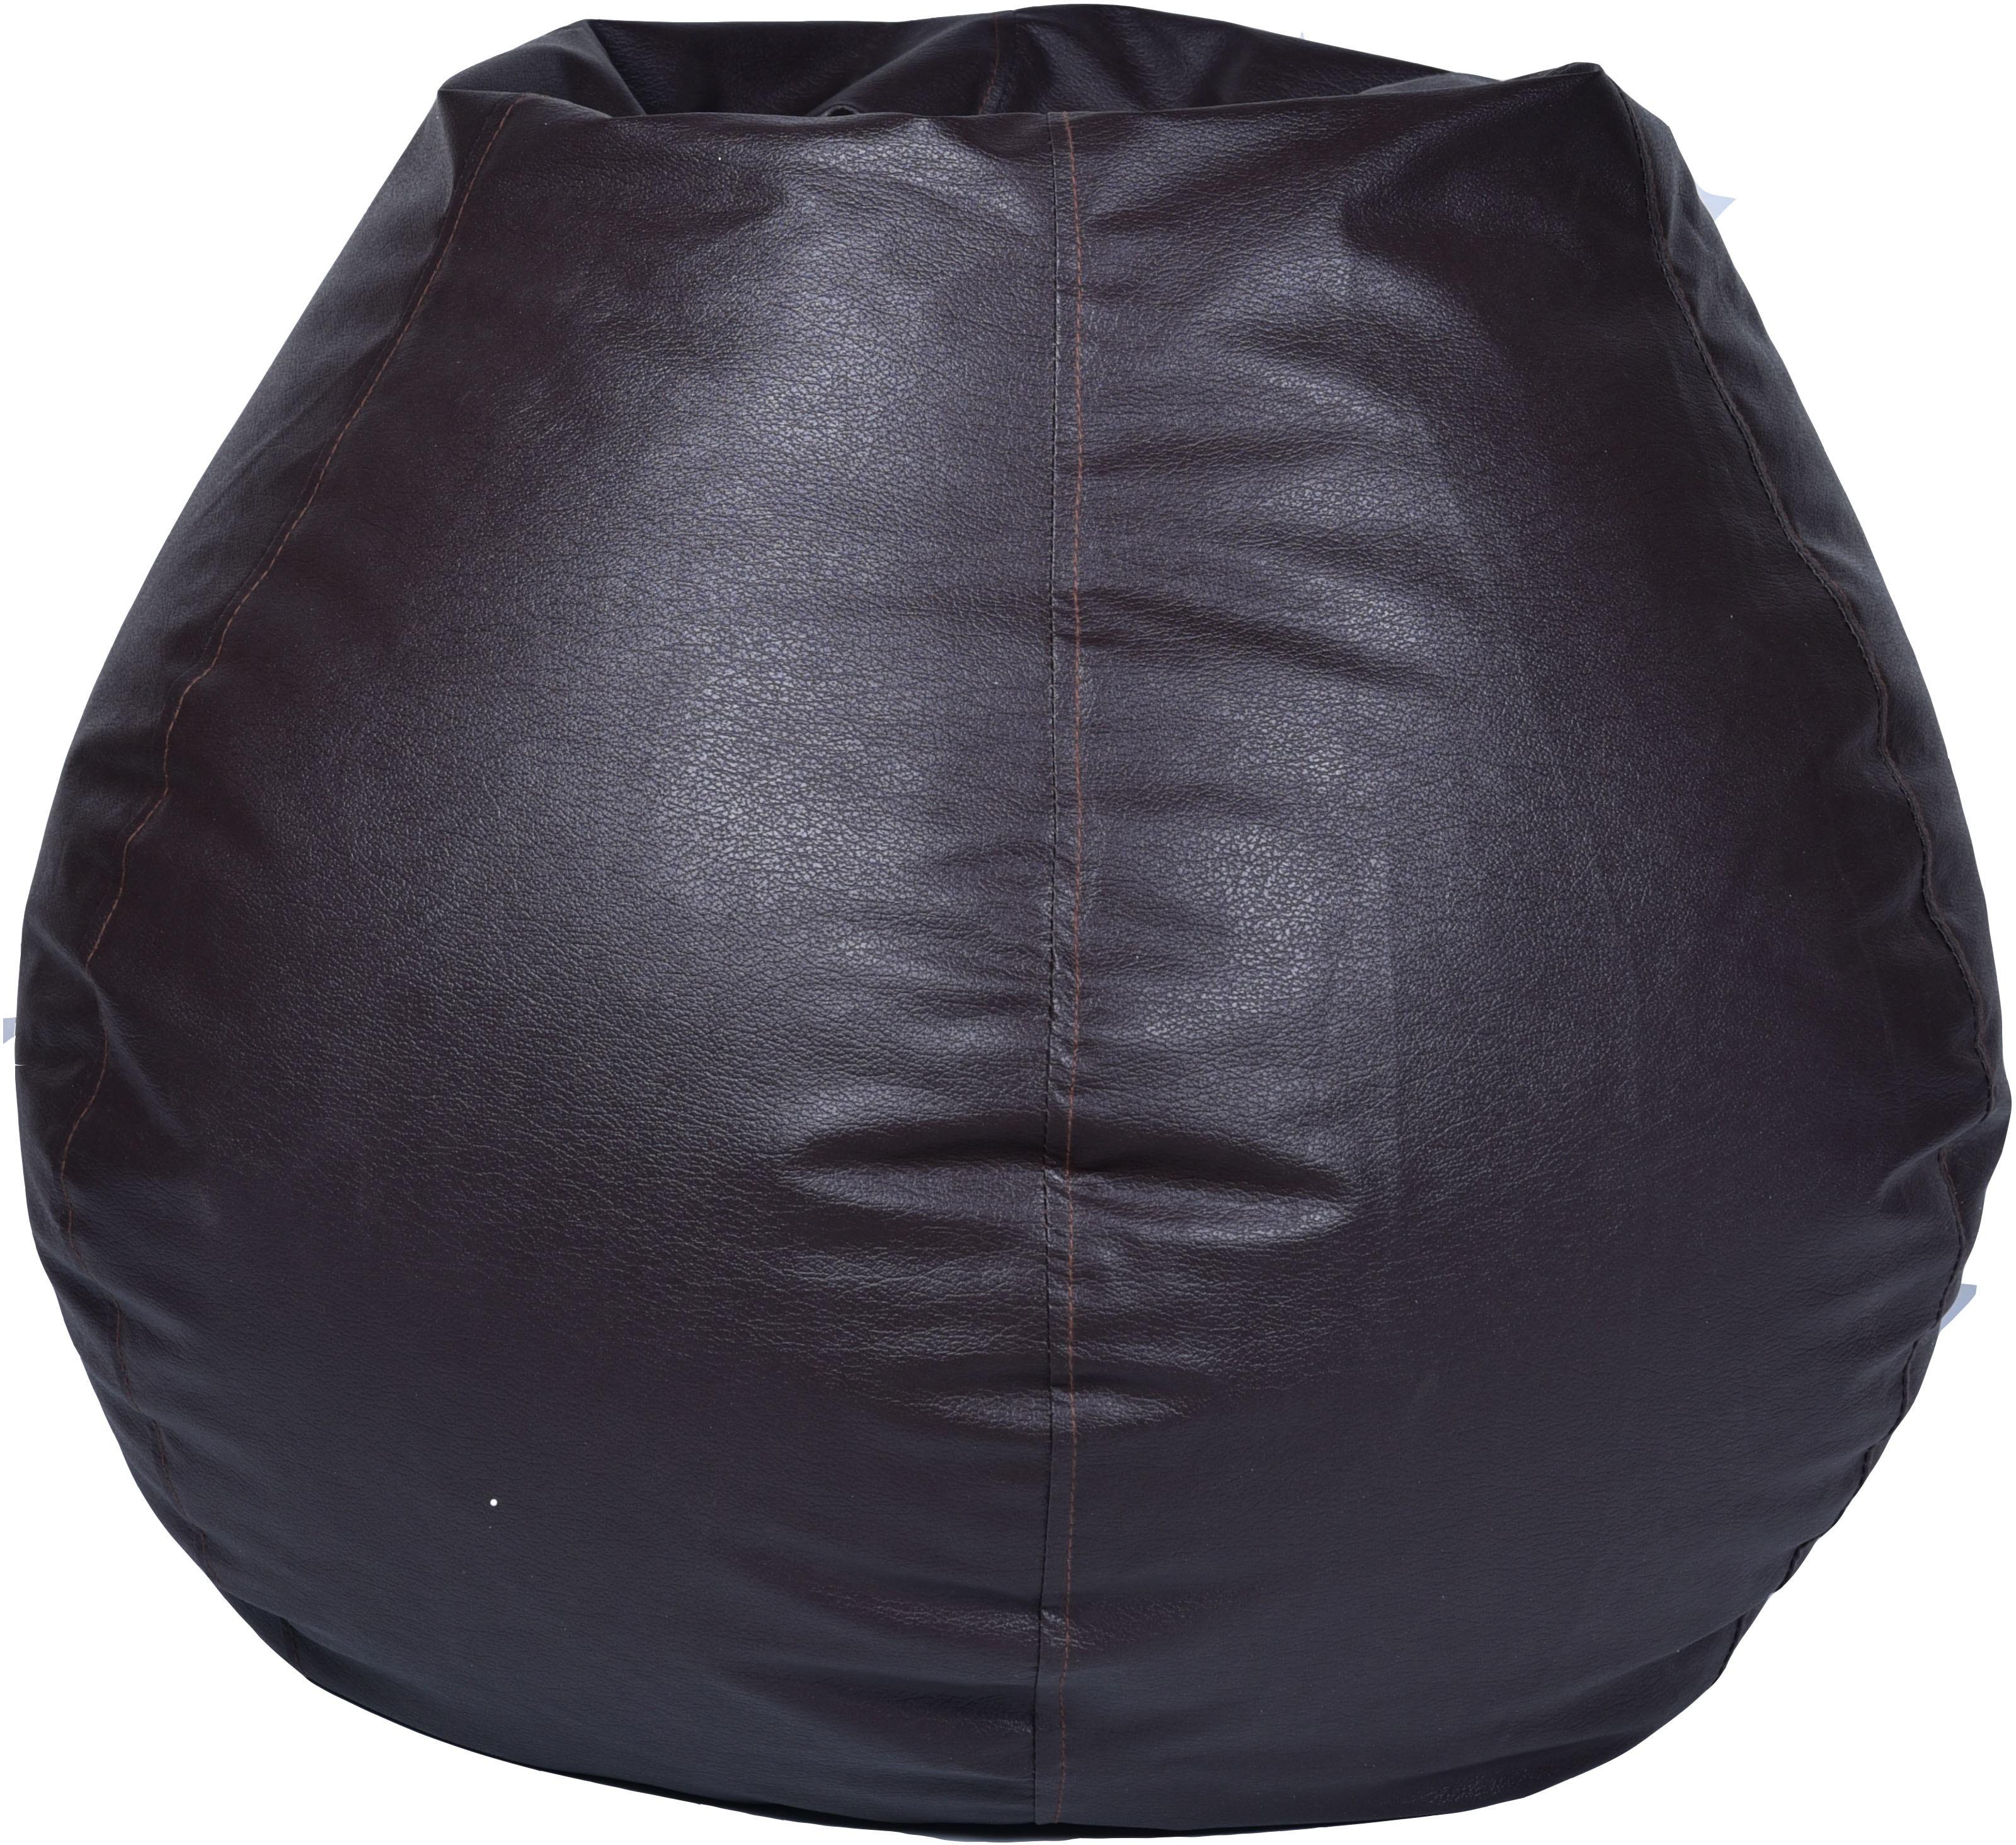 View Mobler XXXL Bean Bag  With Bean Filling(Black) Furniture (Mobler)